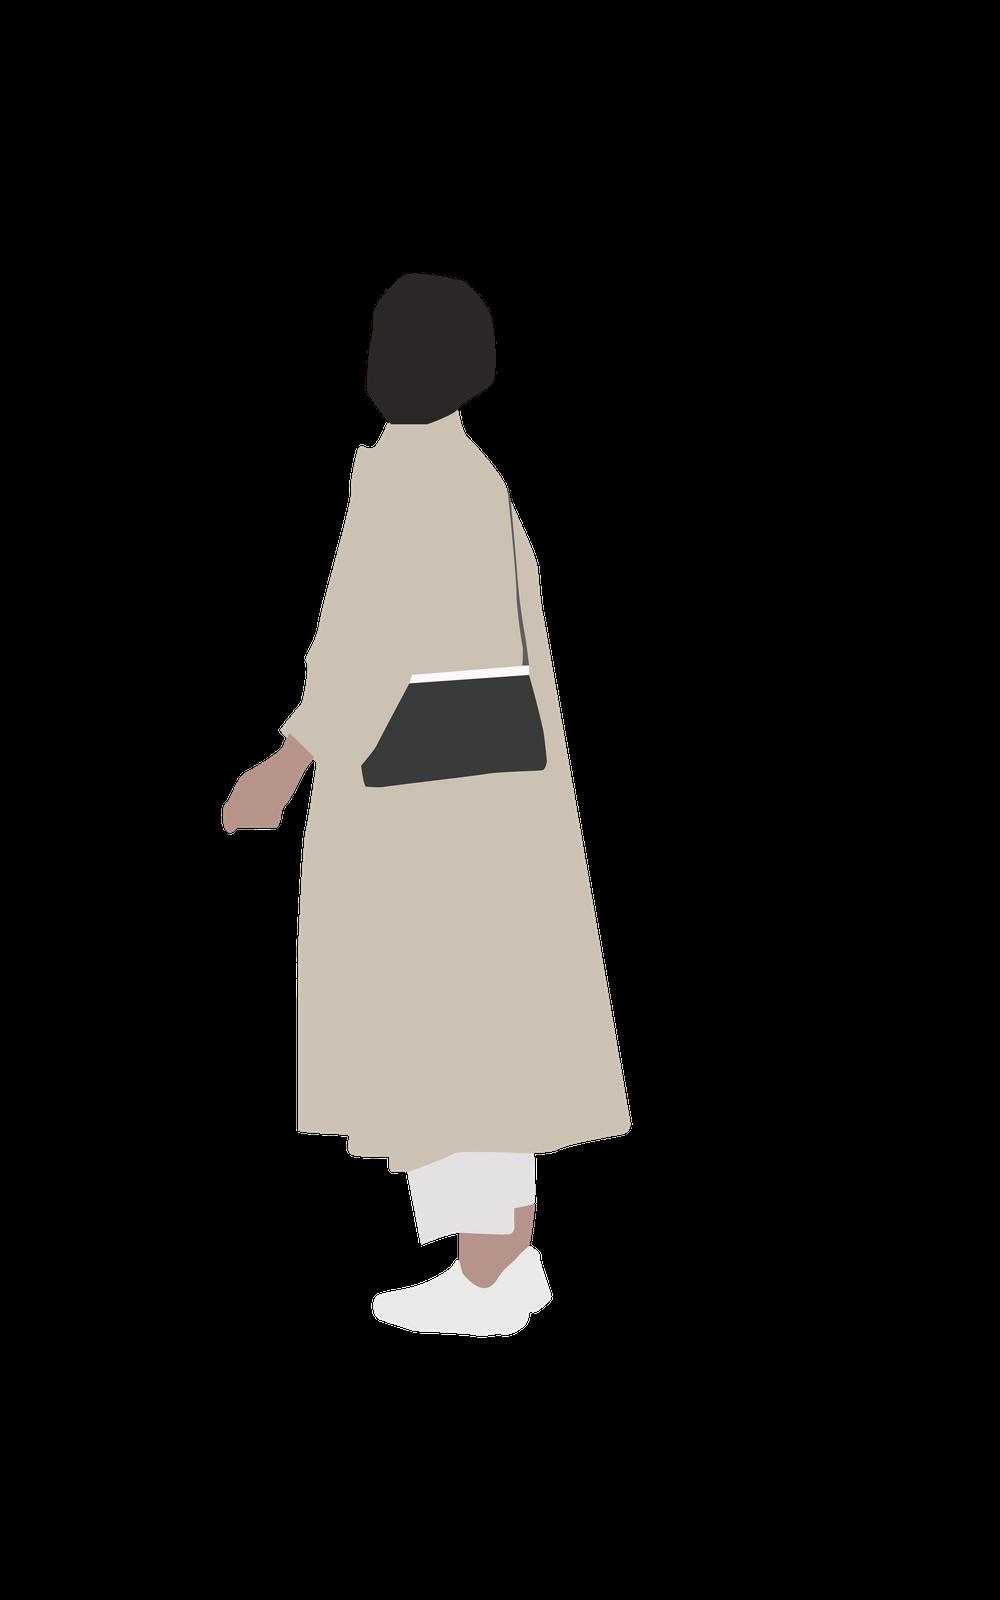 Flat People Laura Beulens Drawing People People Illustration Illustration